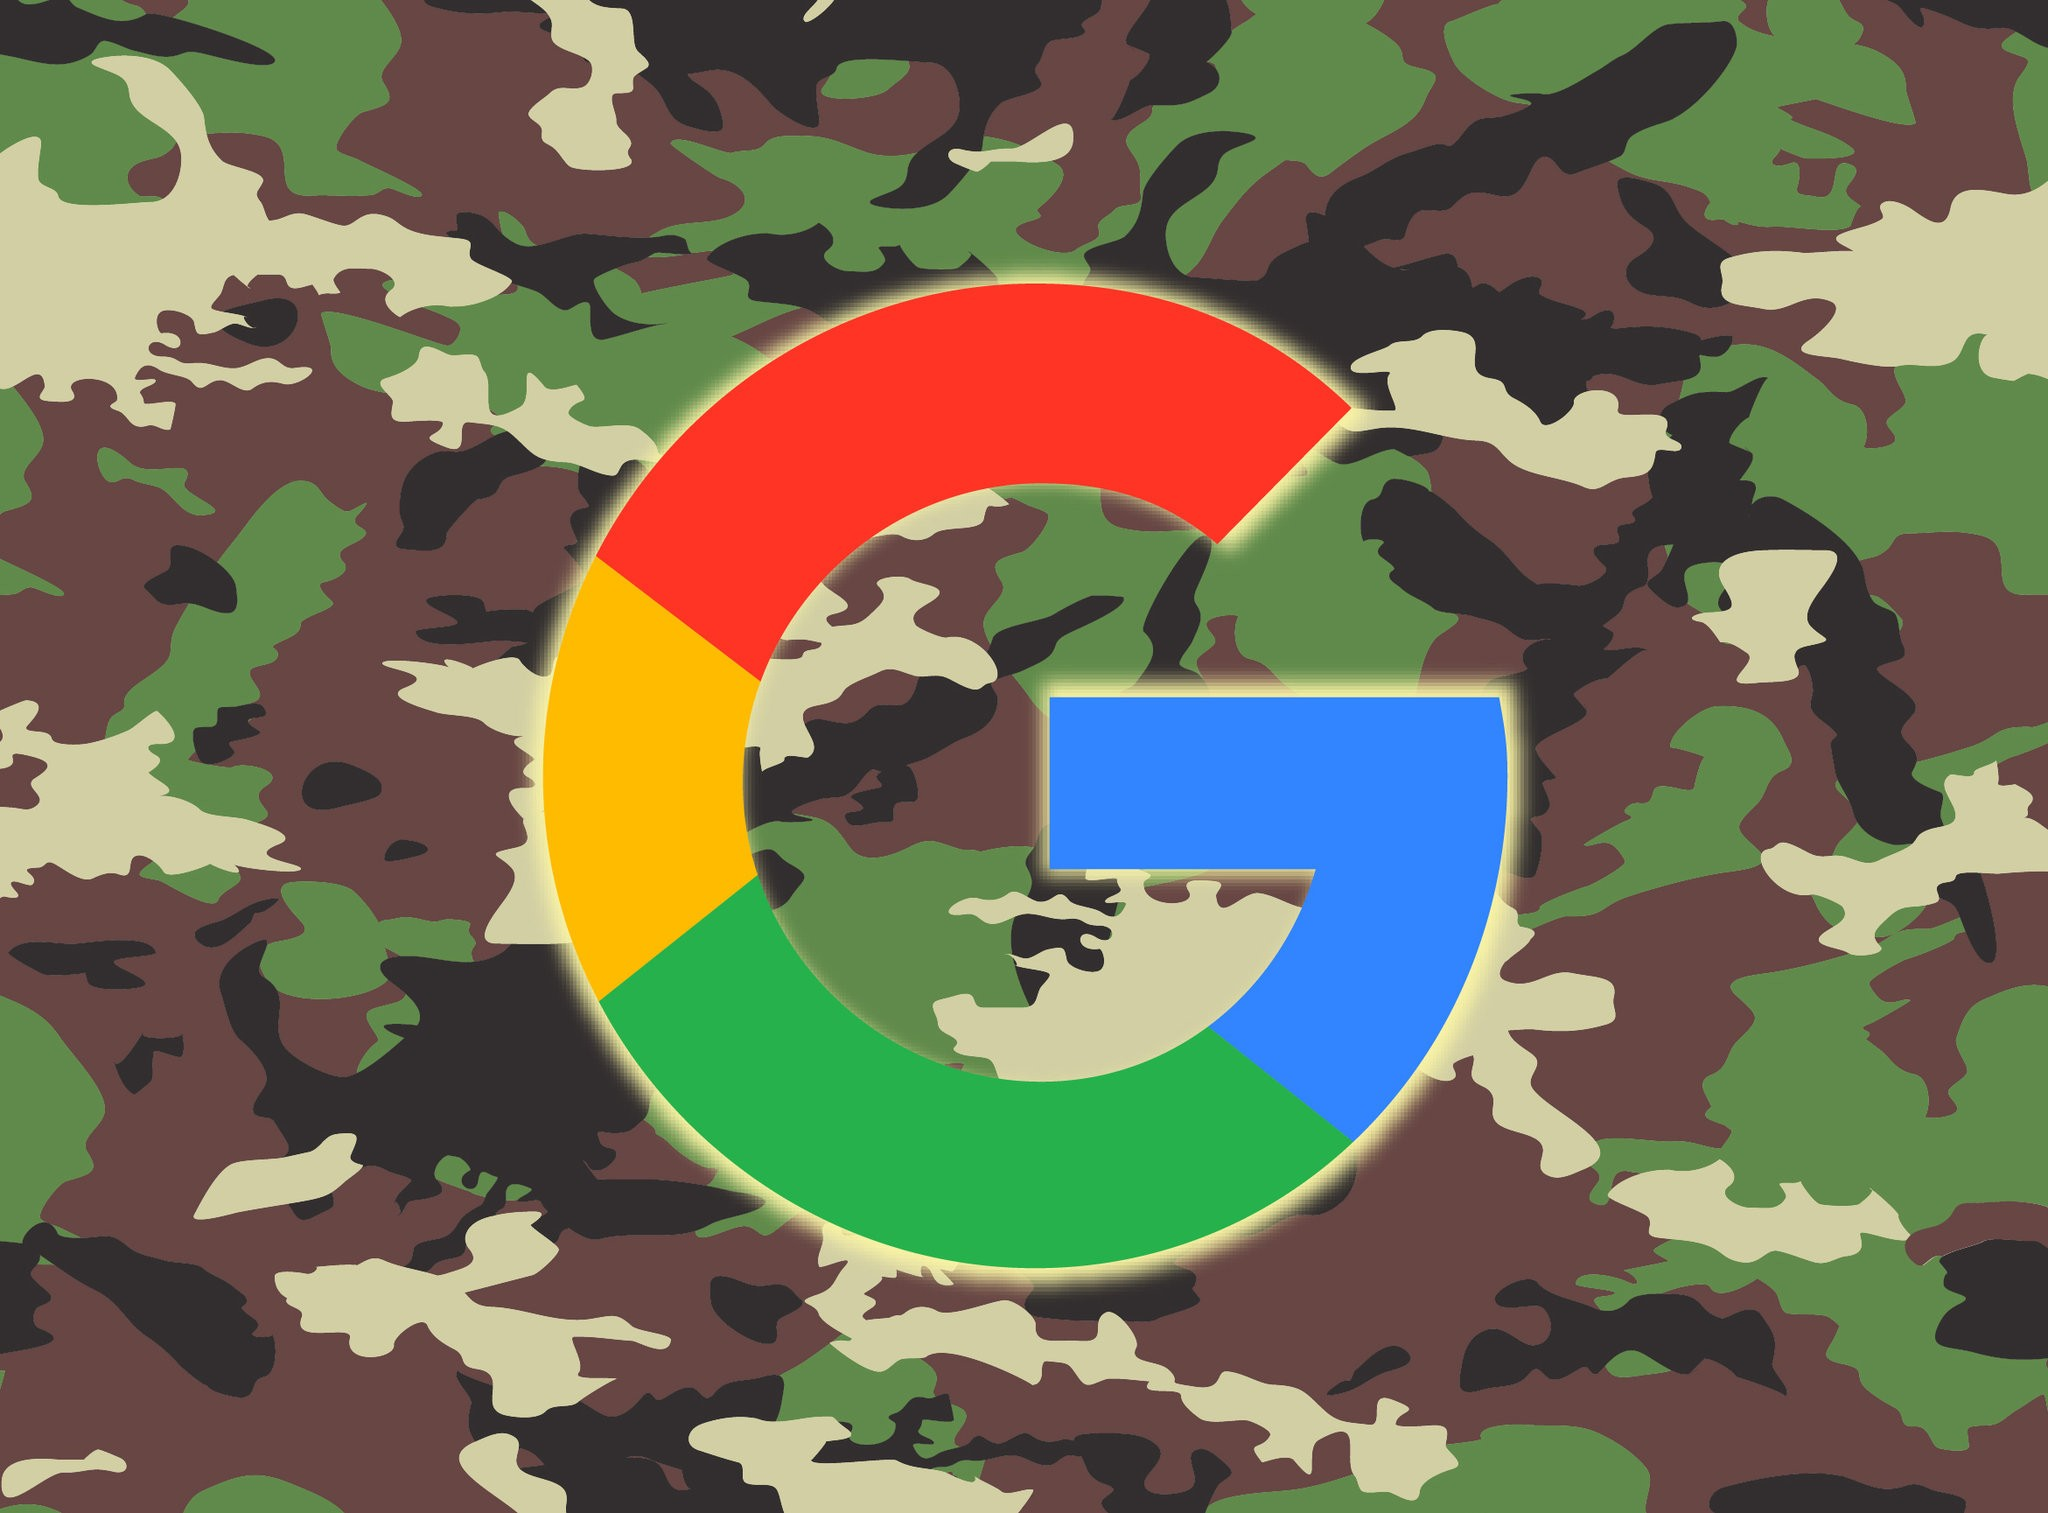 Google与五角大楼的军事AI合作是怎么变成一场危机的?